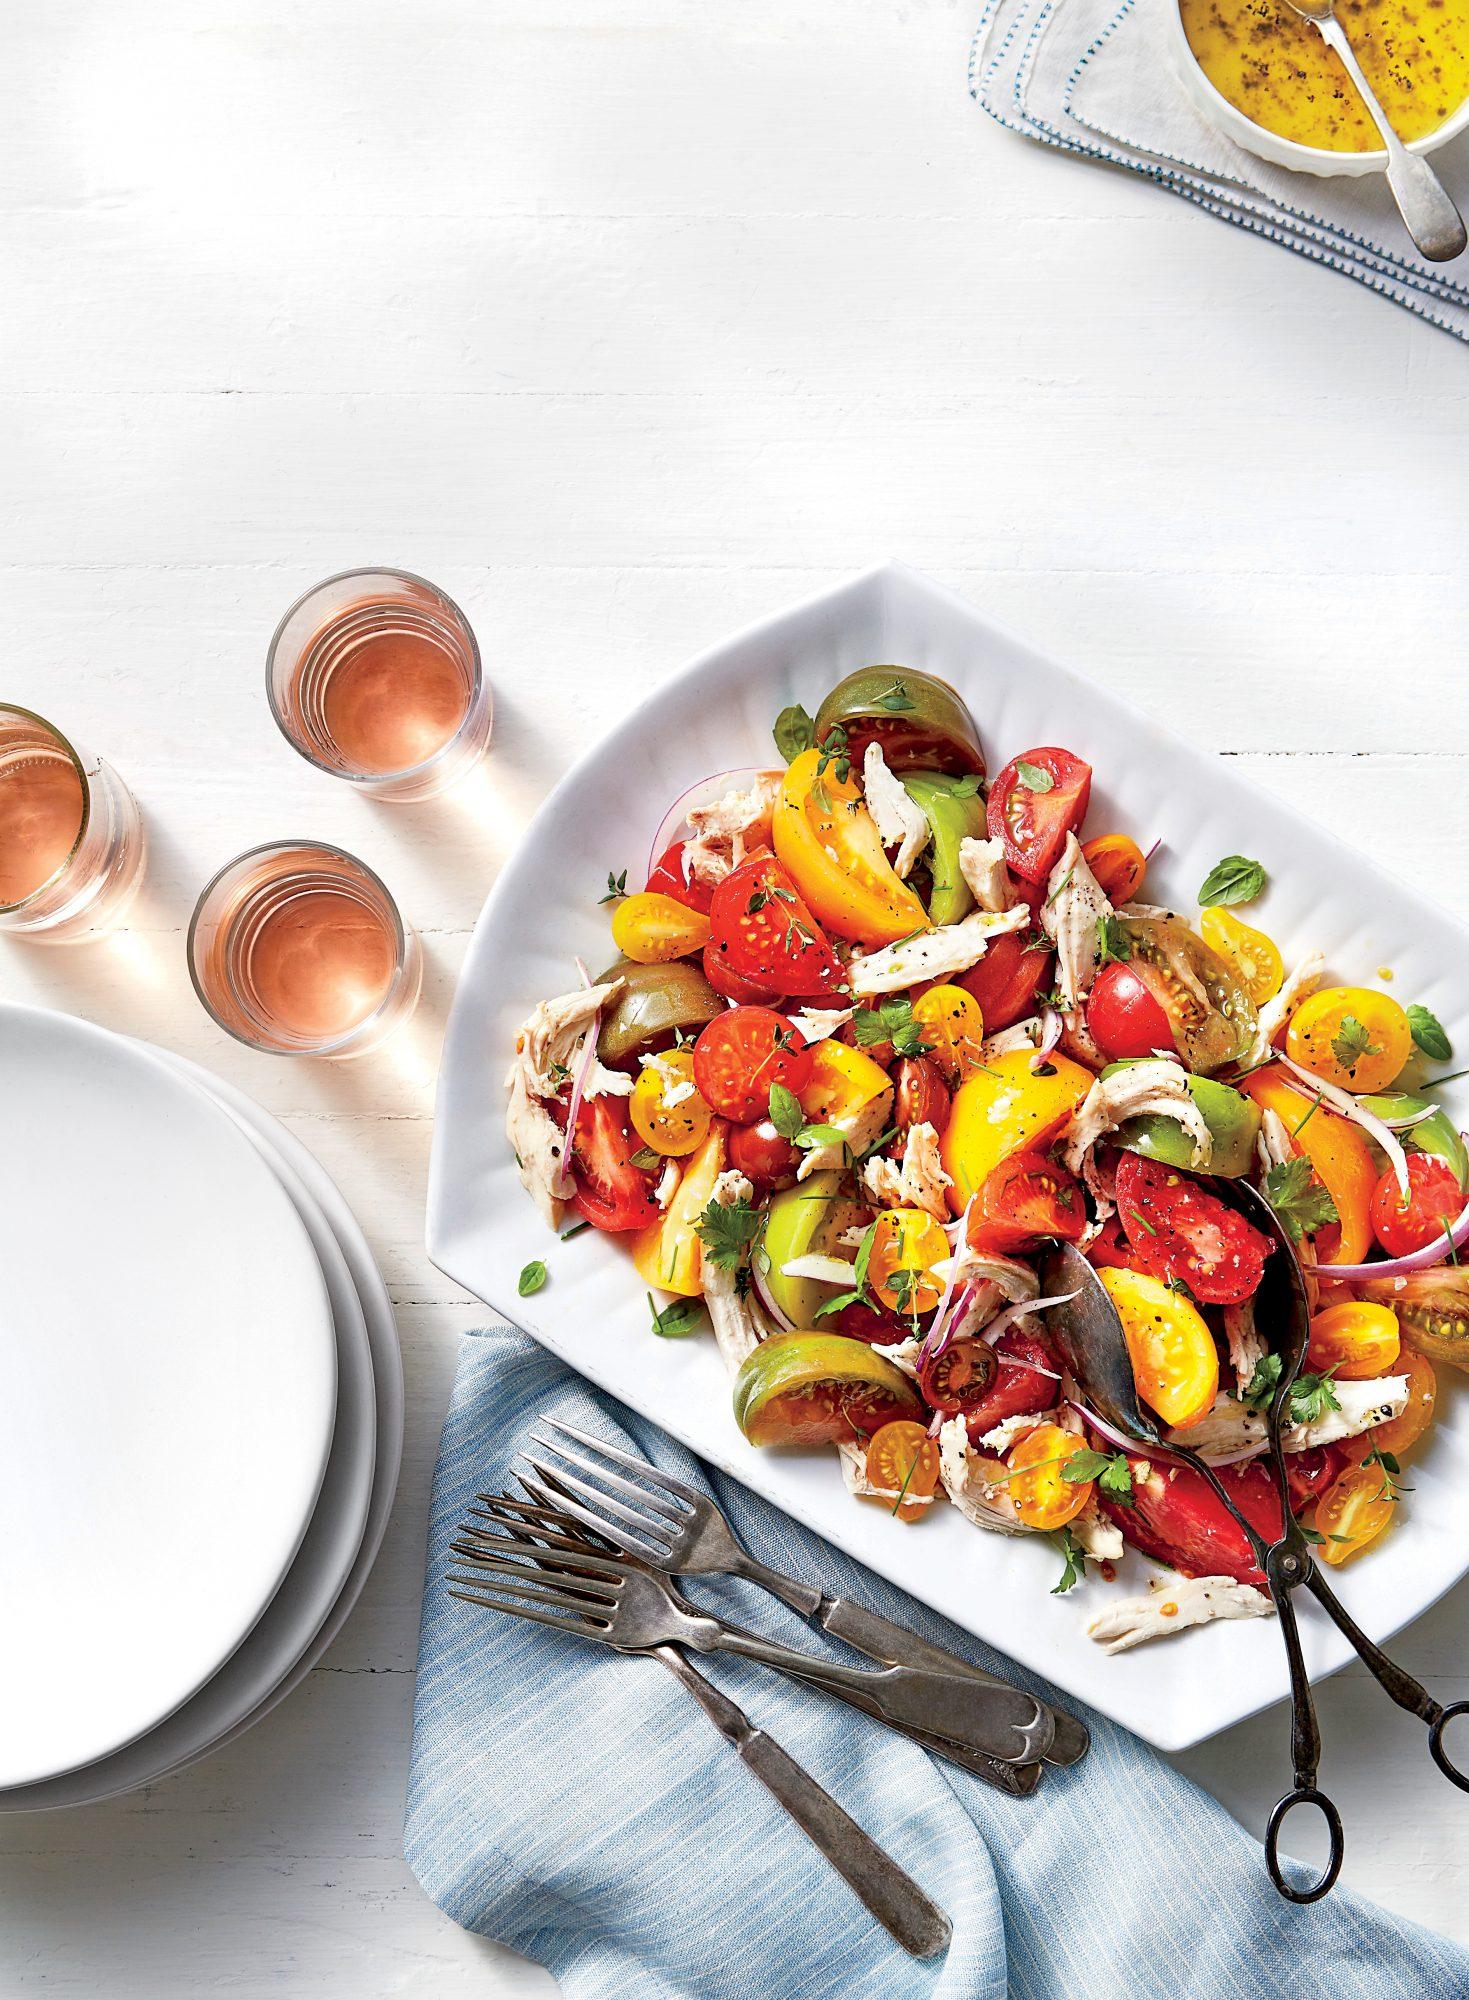 Heirloom Tomato and Chicken Toss